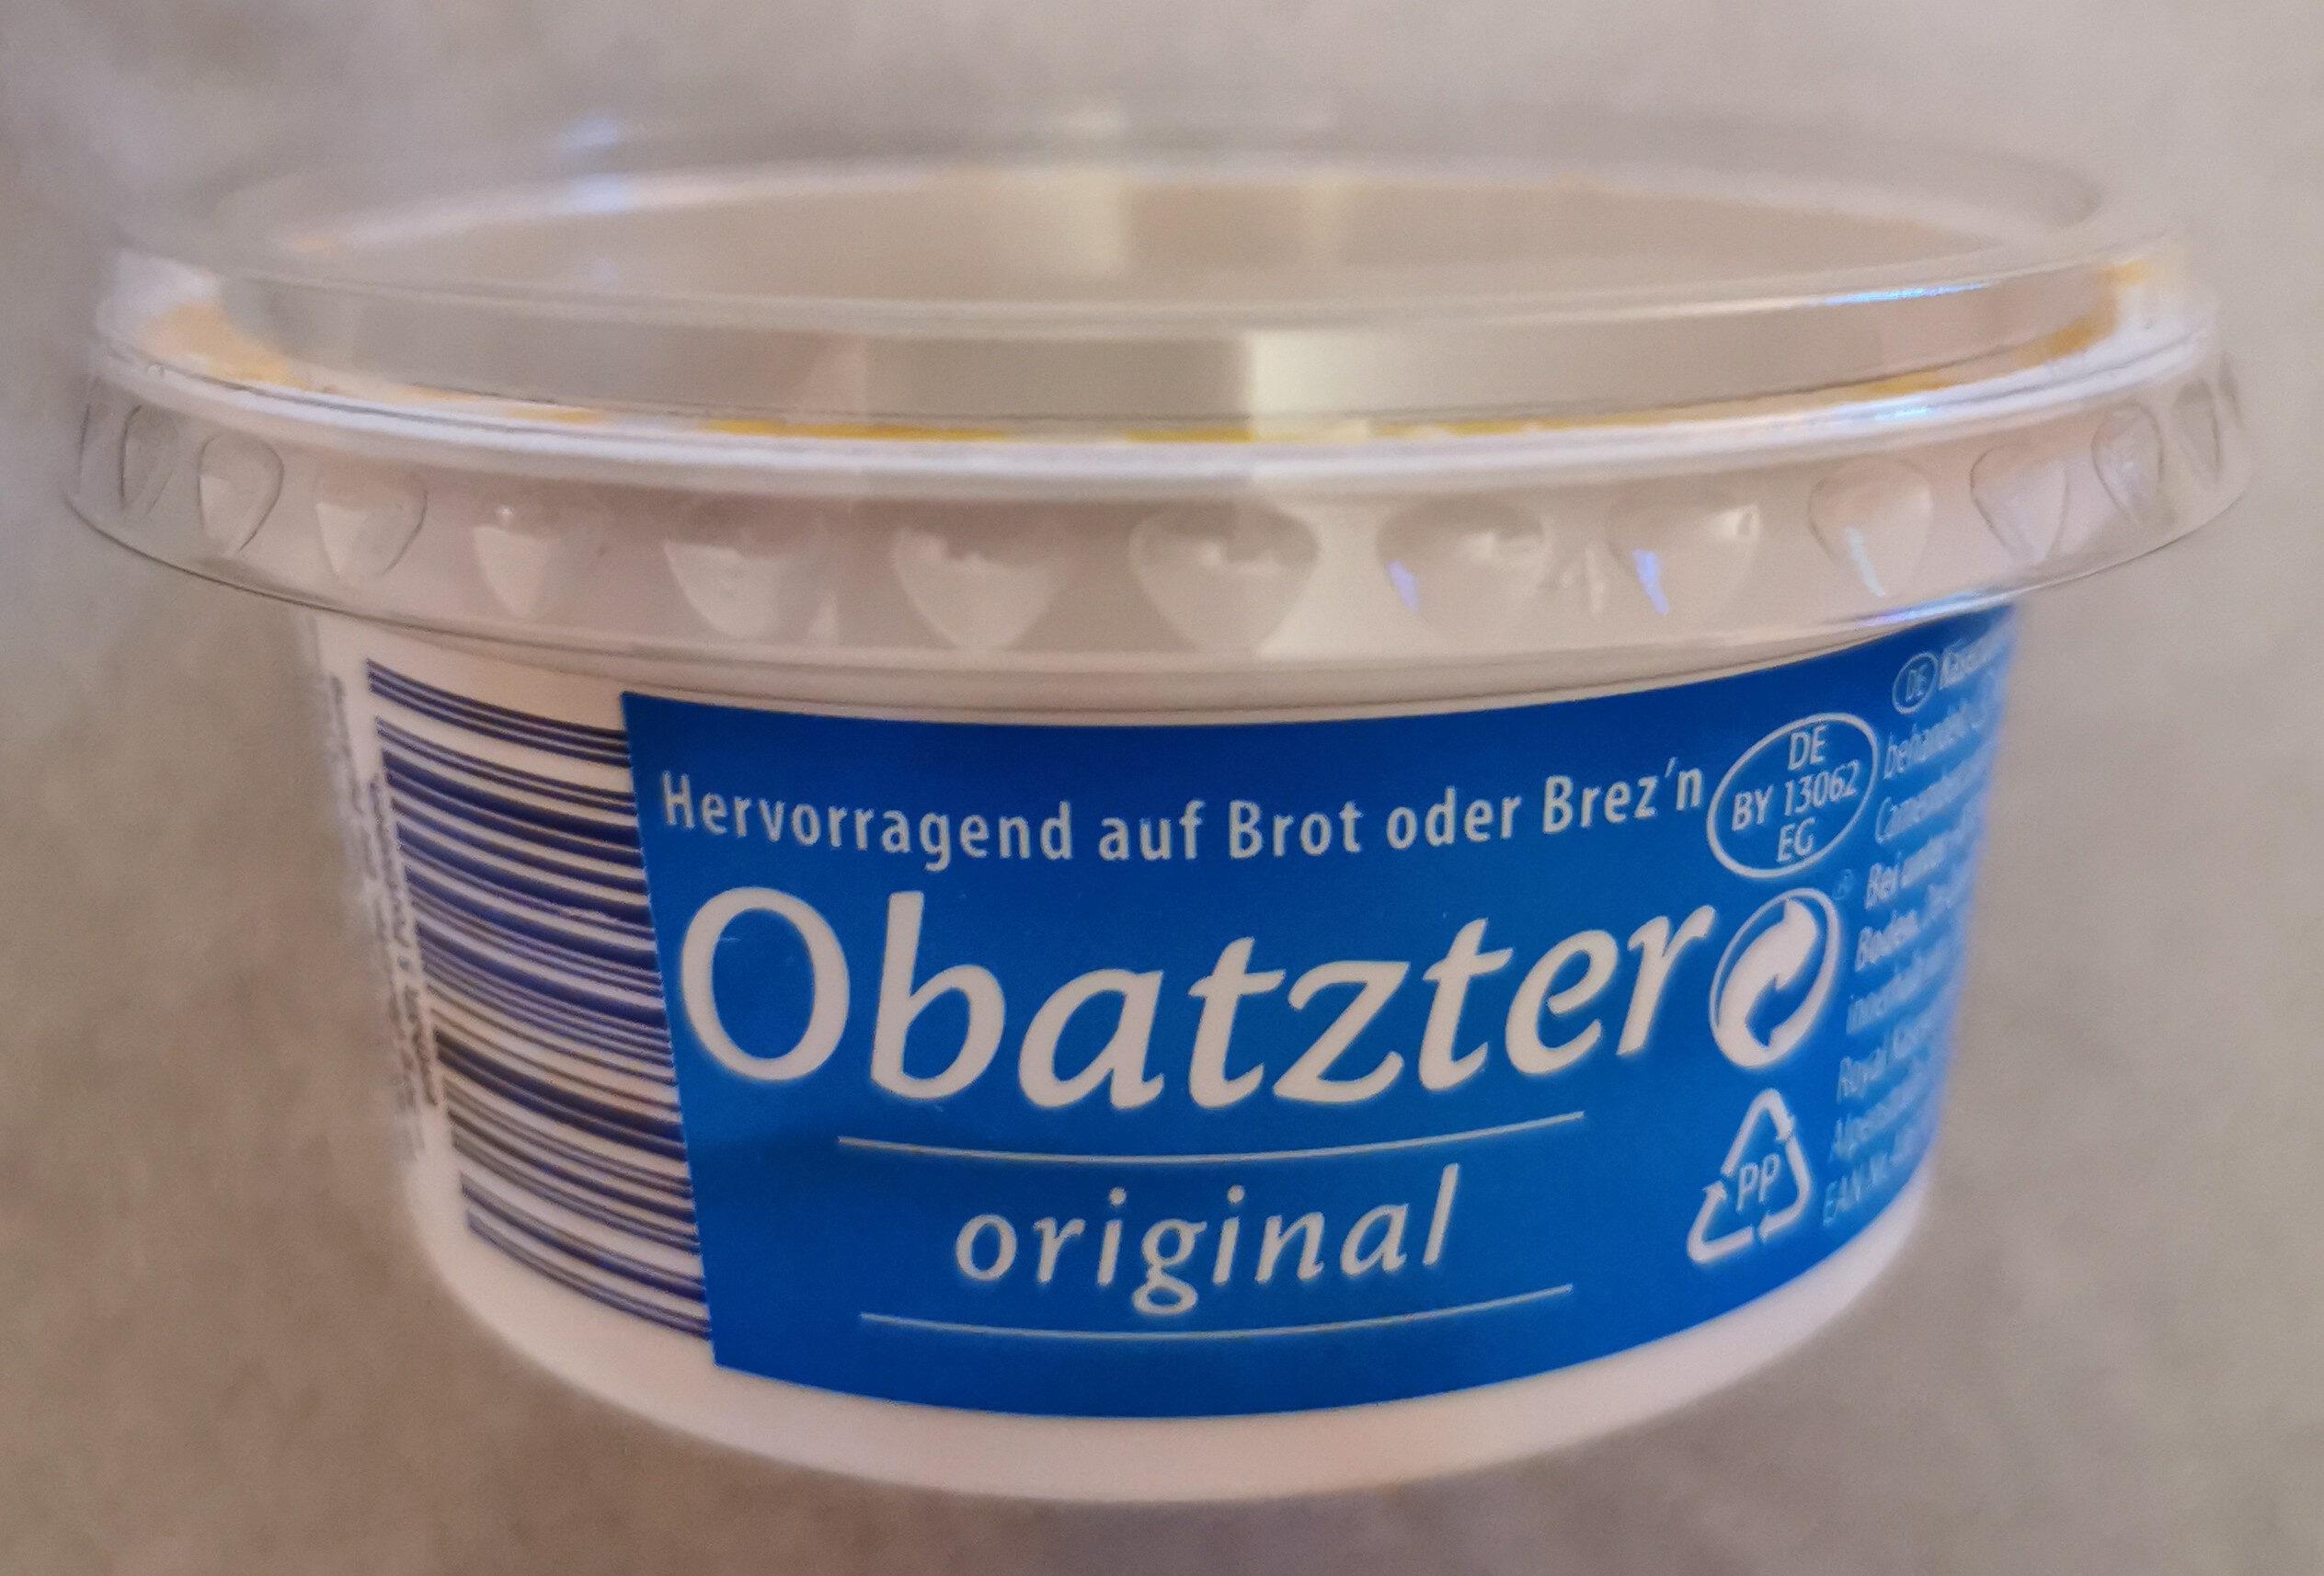 Obatzter - Product